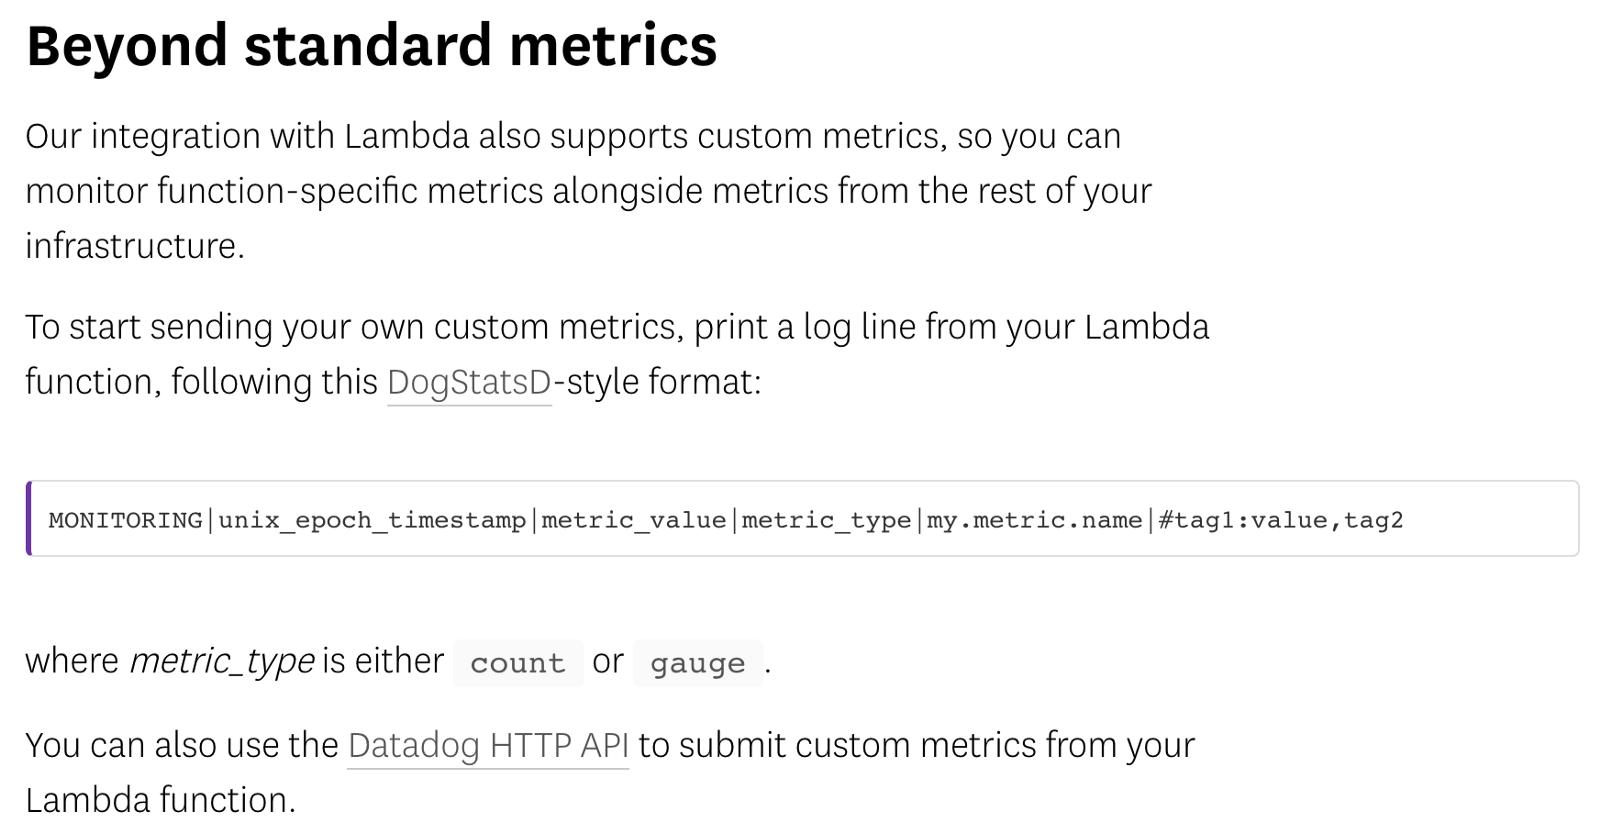 Tips and tricks for logging and monitoring AWS Lambda